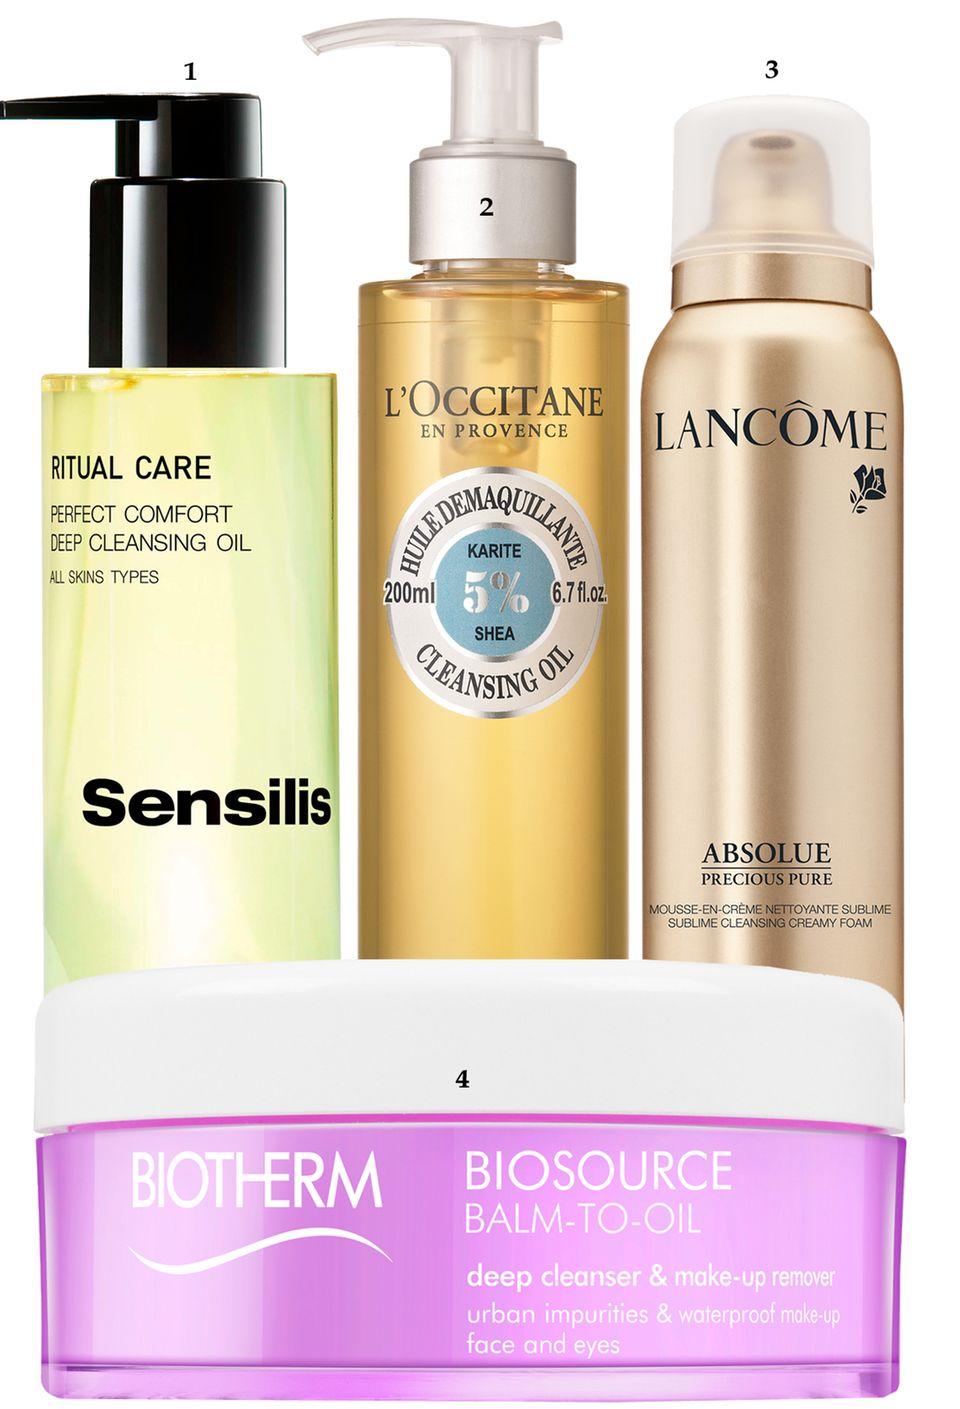 "1. ""Ritual Care Perfect Comfort Deep Cleansing Oil"" von Sensilis, 150 ml, ca. 20 Euro; 2. ""Huile Démaquillante"" von L'Occitane, 200 ml, ca. 20 Euro; 3. ""Absolue Precious Pure"" von Lancôme, 150 ml, ca. 80 Euro; 4. ""Biosource Balm-to-Oil"" von Biotherm, 100 ml, ca. 30 Euro"